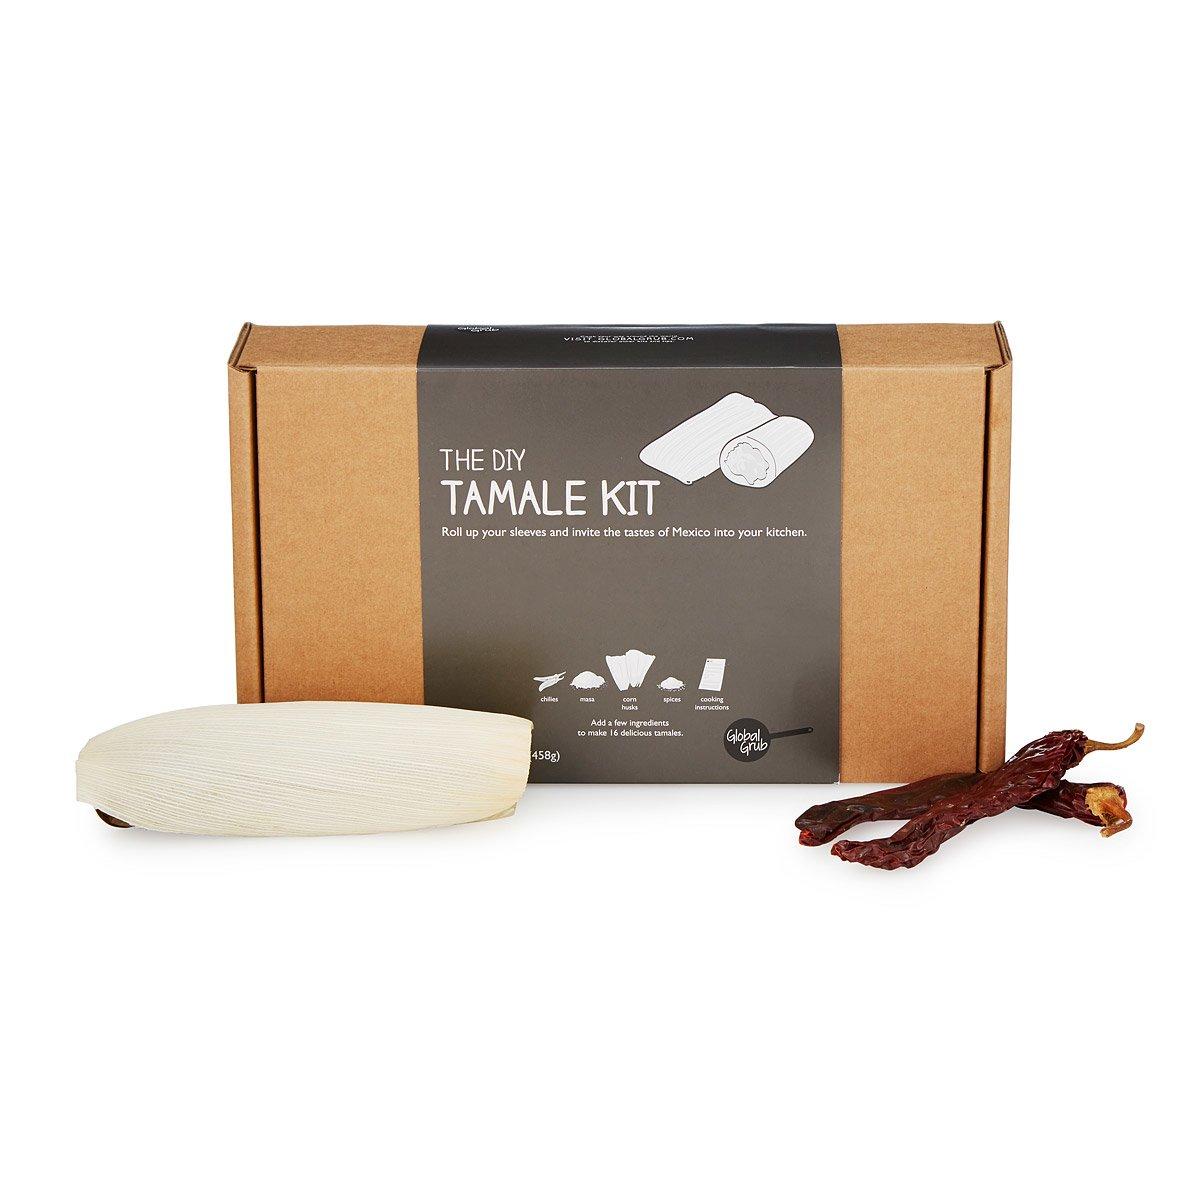 2018 diy kits craft kits uncommongoods diy tamale kit solutioingenieria Gallery